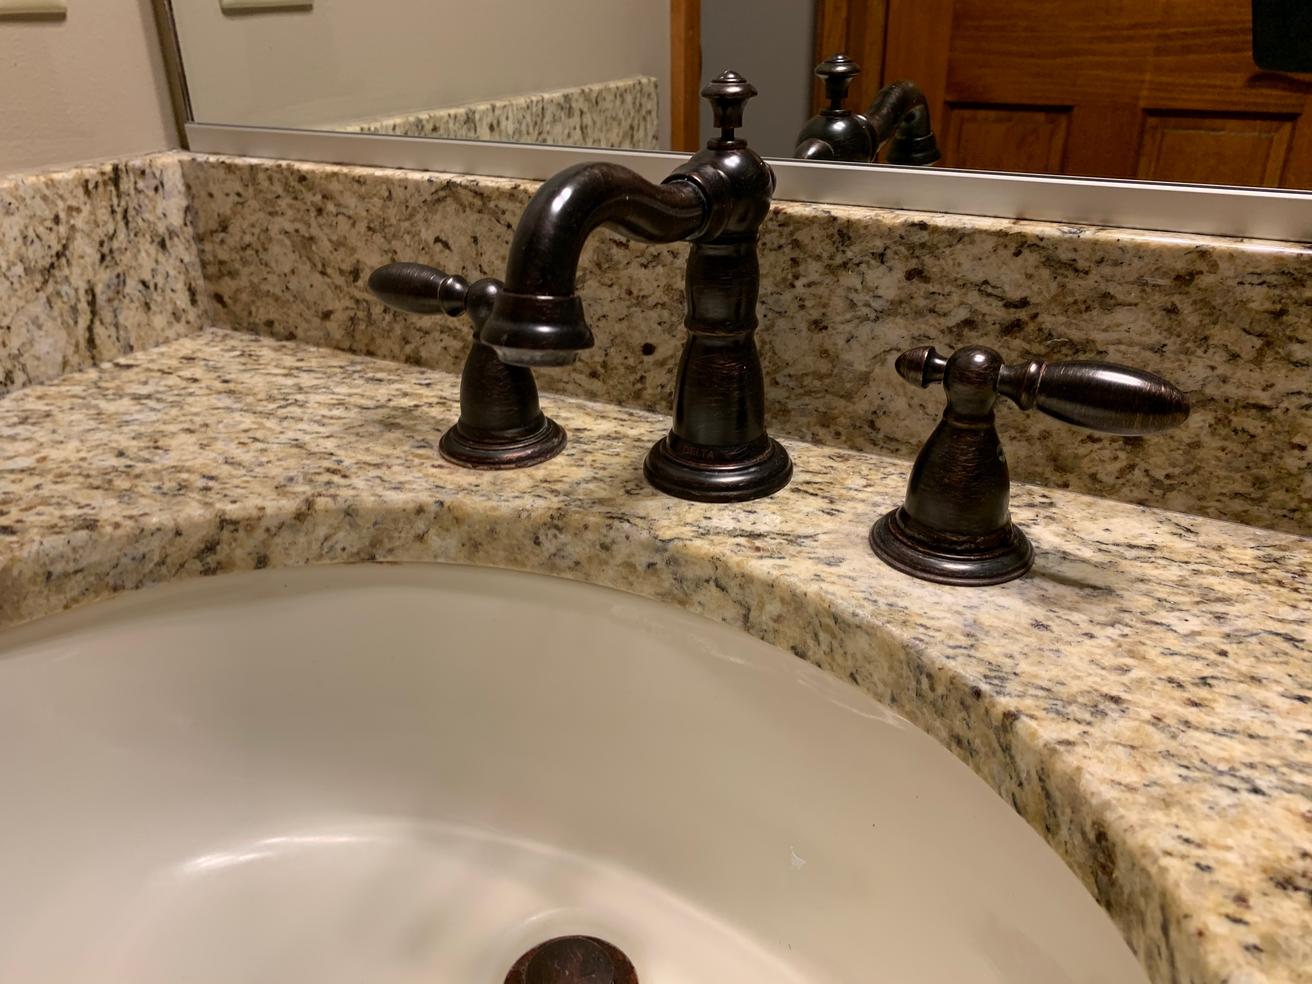 2nd Bathroom Sink